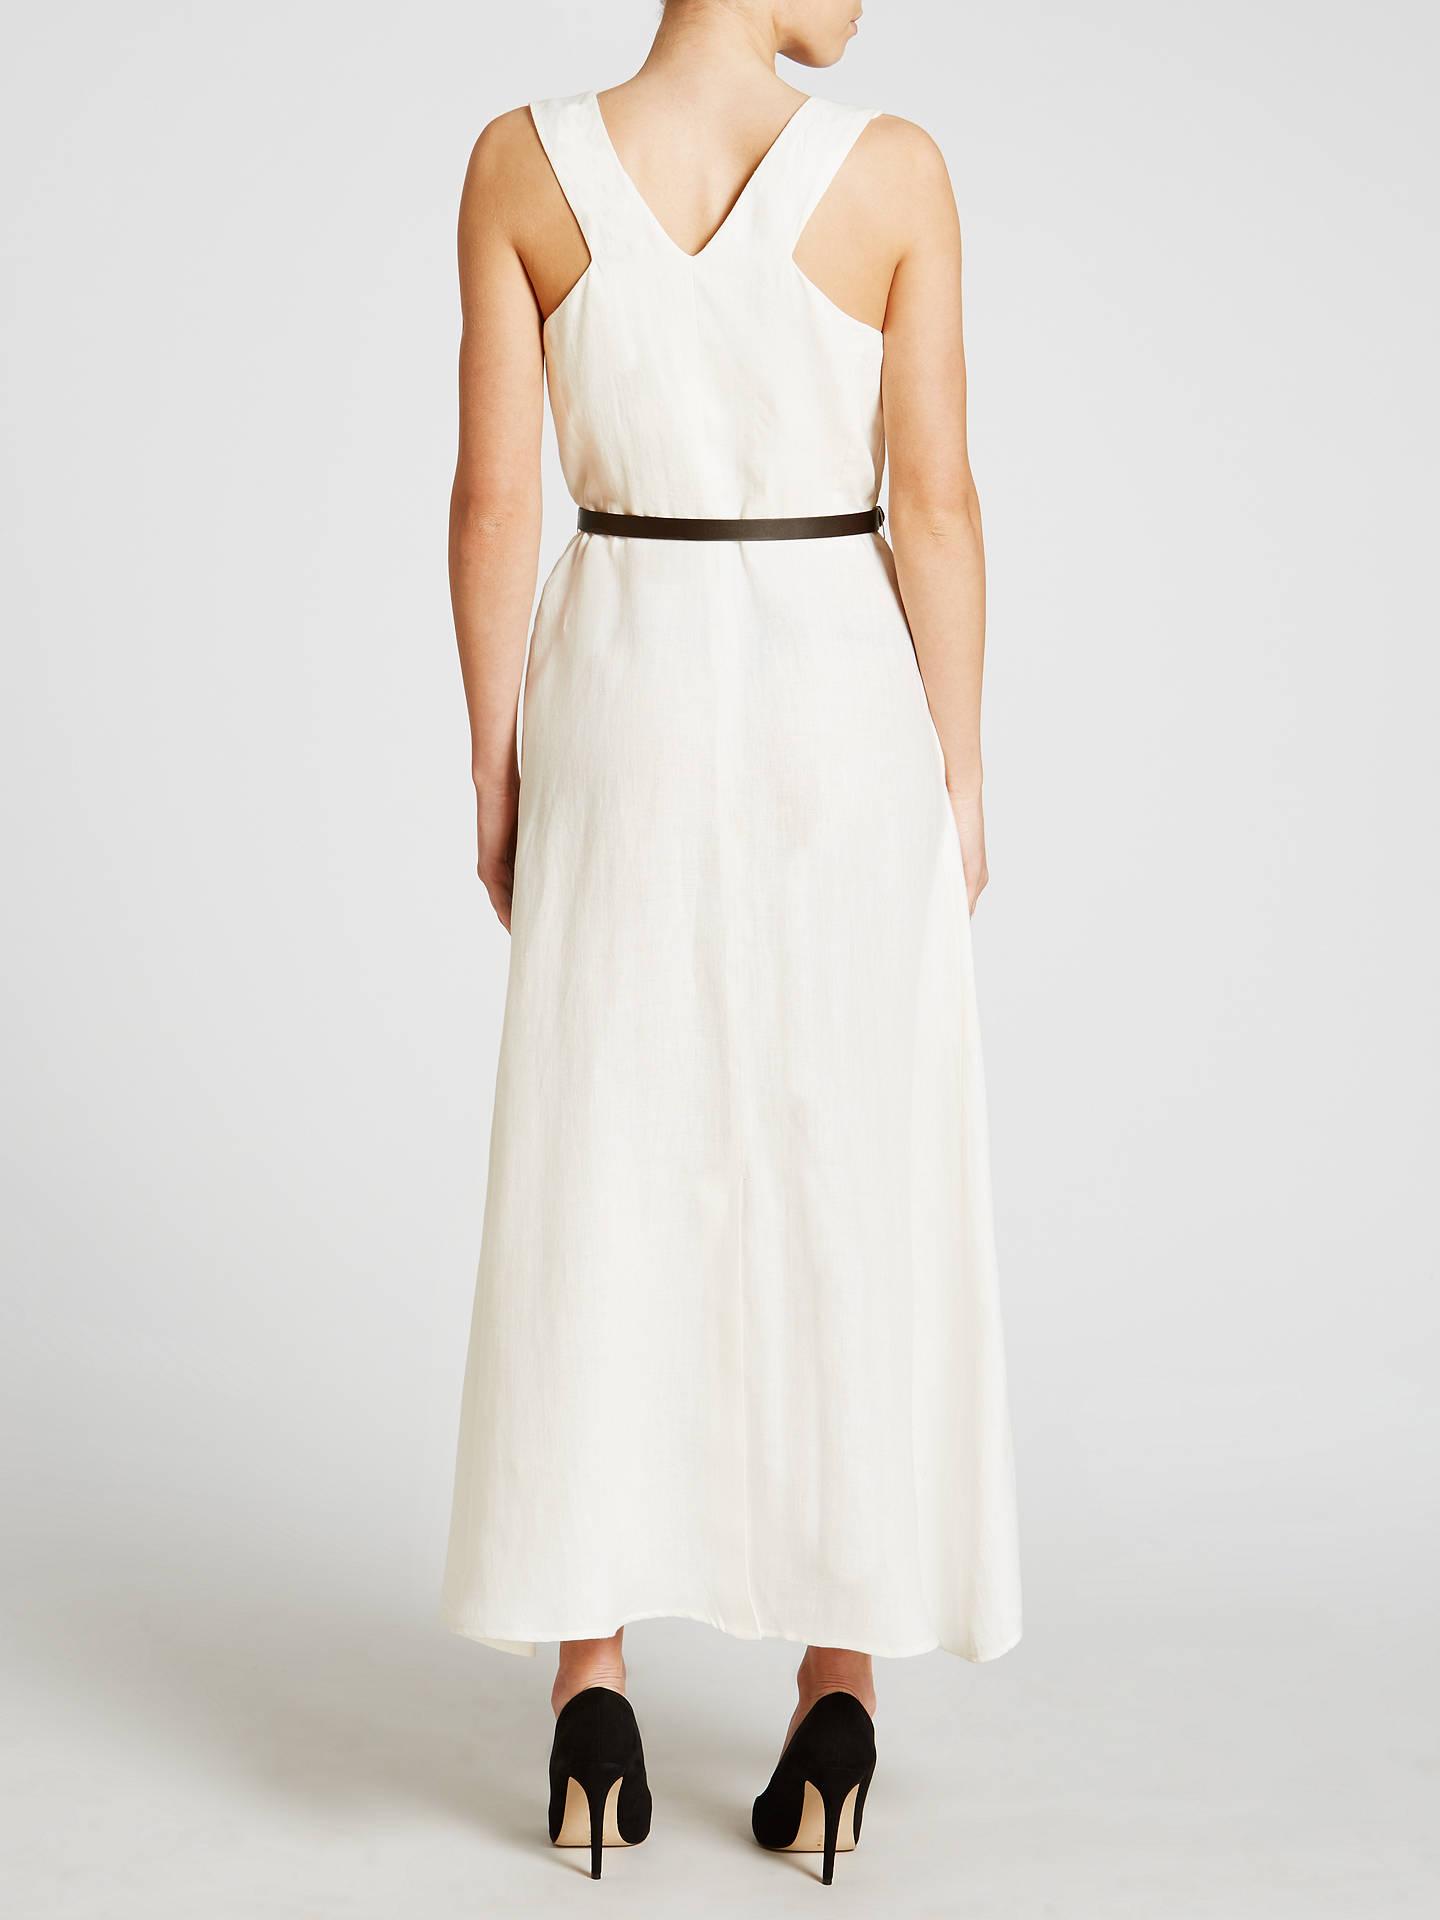 6f2db7ef03 ... Buy Weekend MaxMara Amico Belted Linen Dress